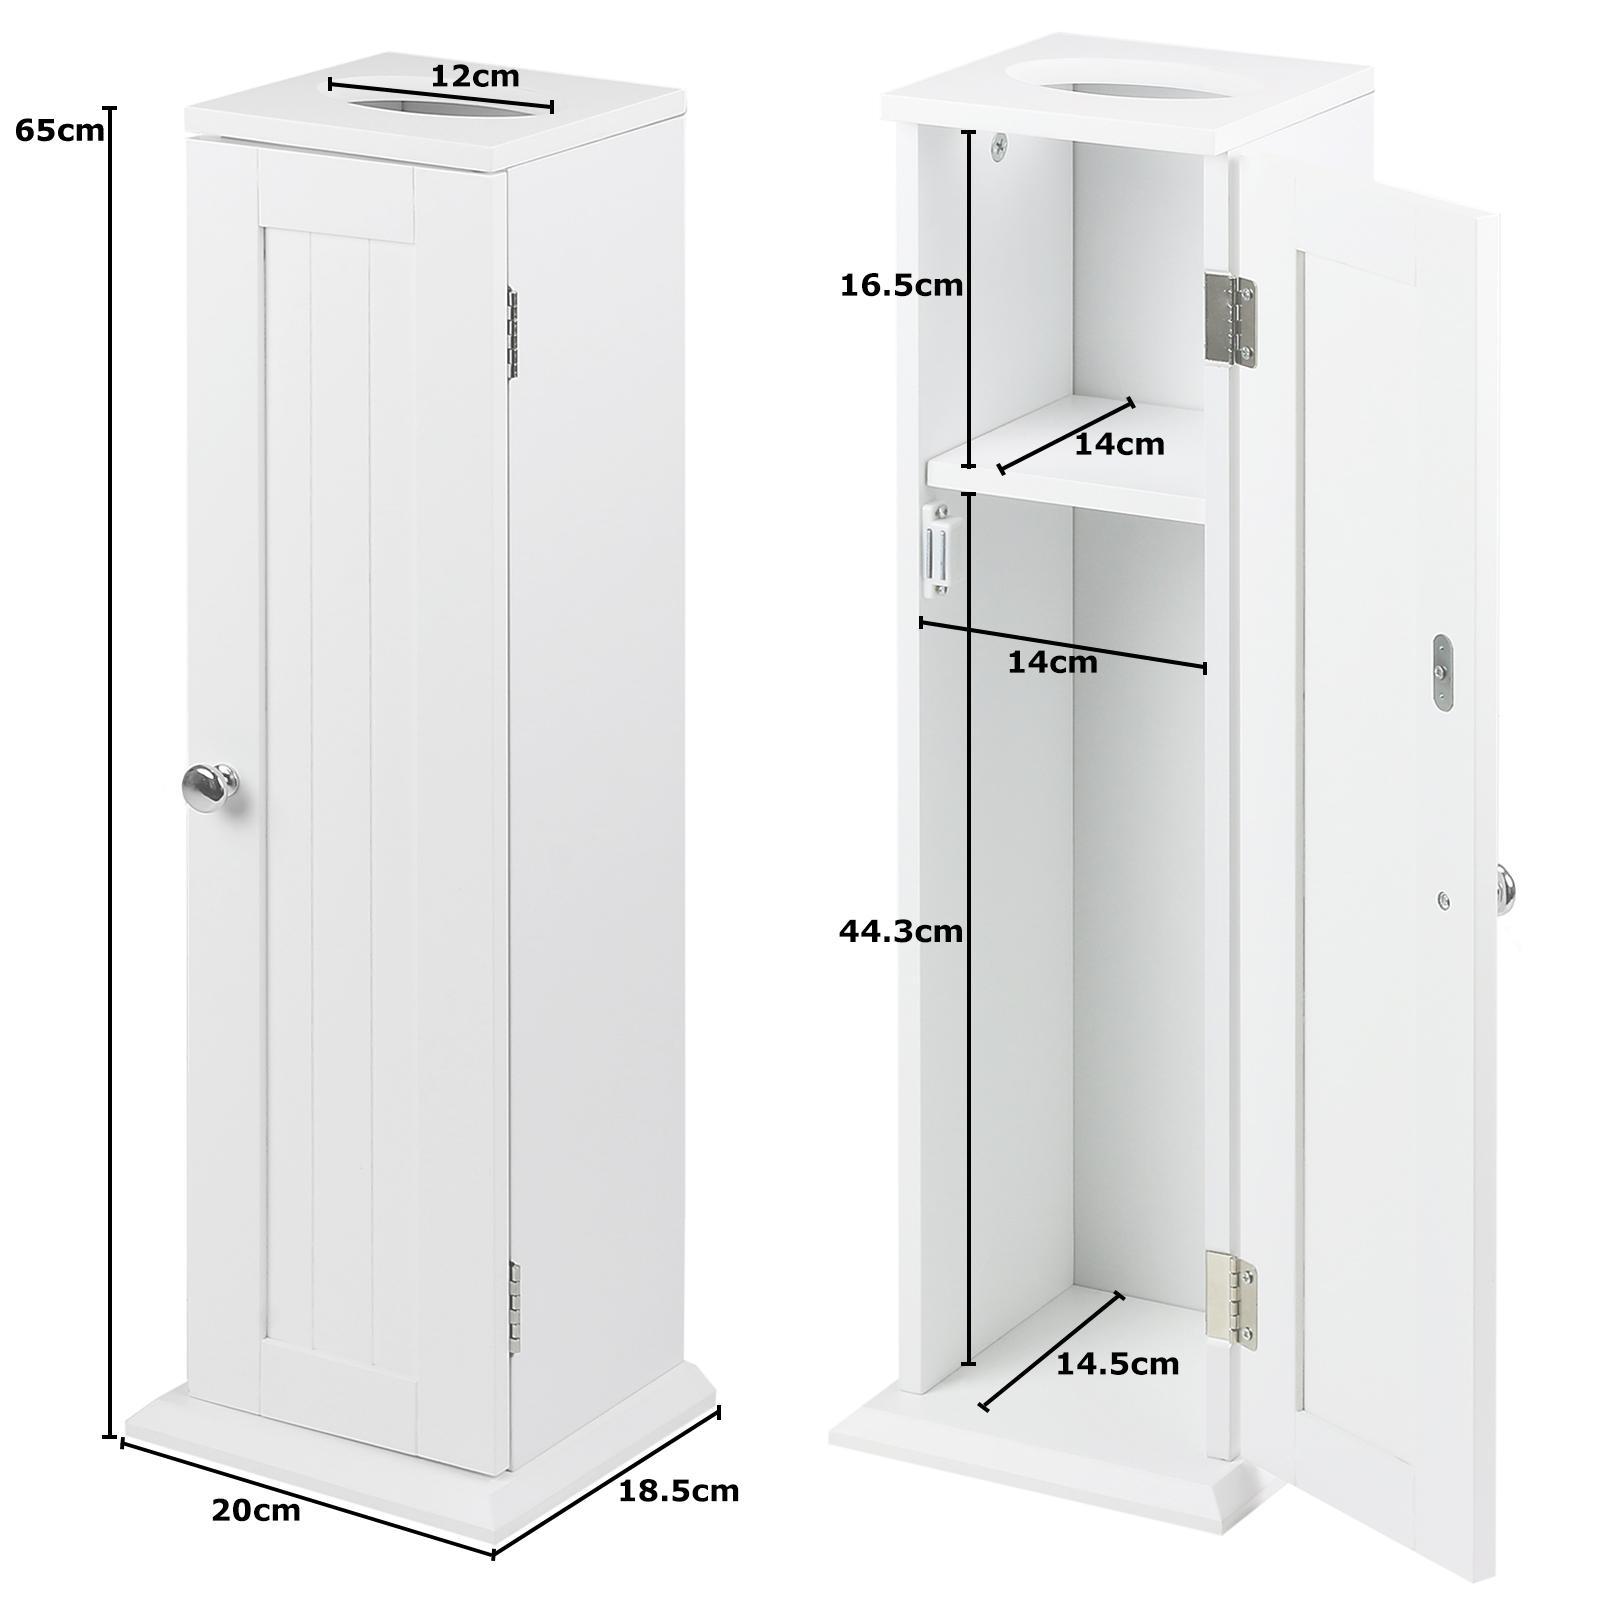 hartleys white bathroom storage unit toilet roll brush tissue holder cabinet ebay. Black Bedroom Furniture Sets. Home Design Ideas